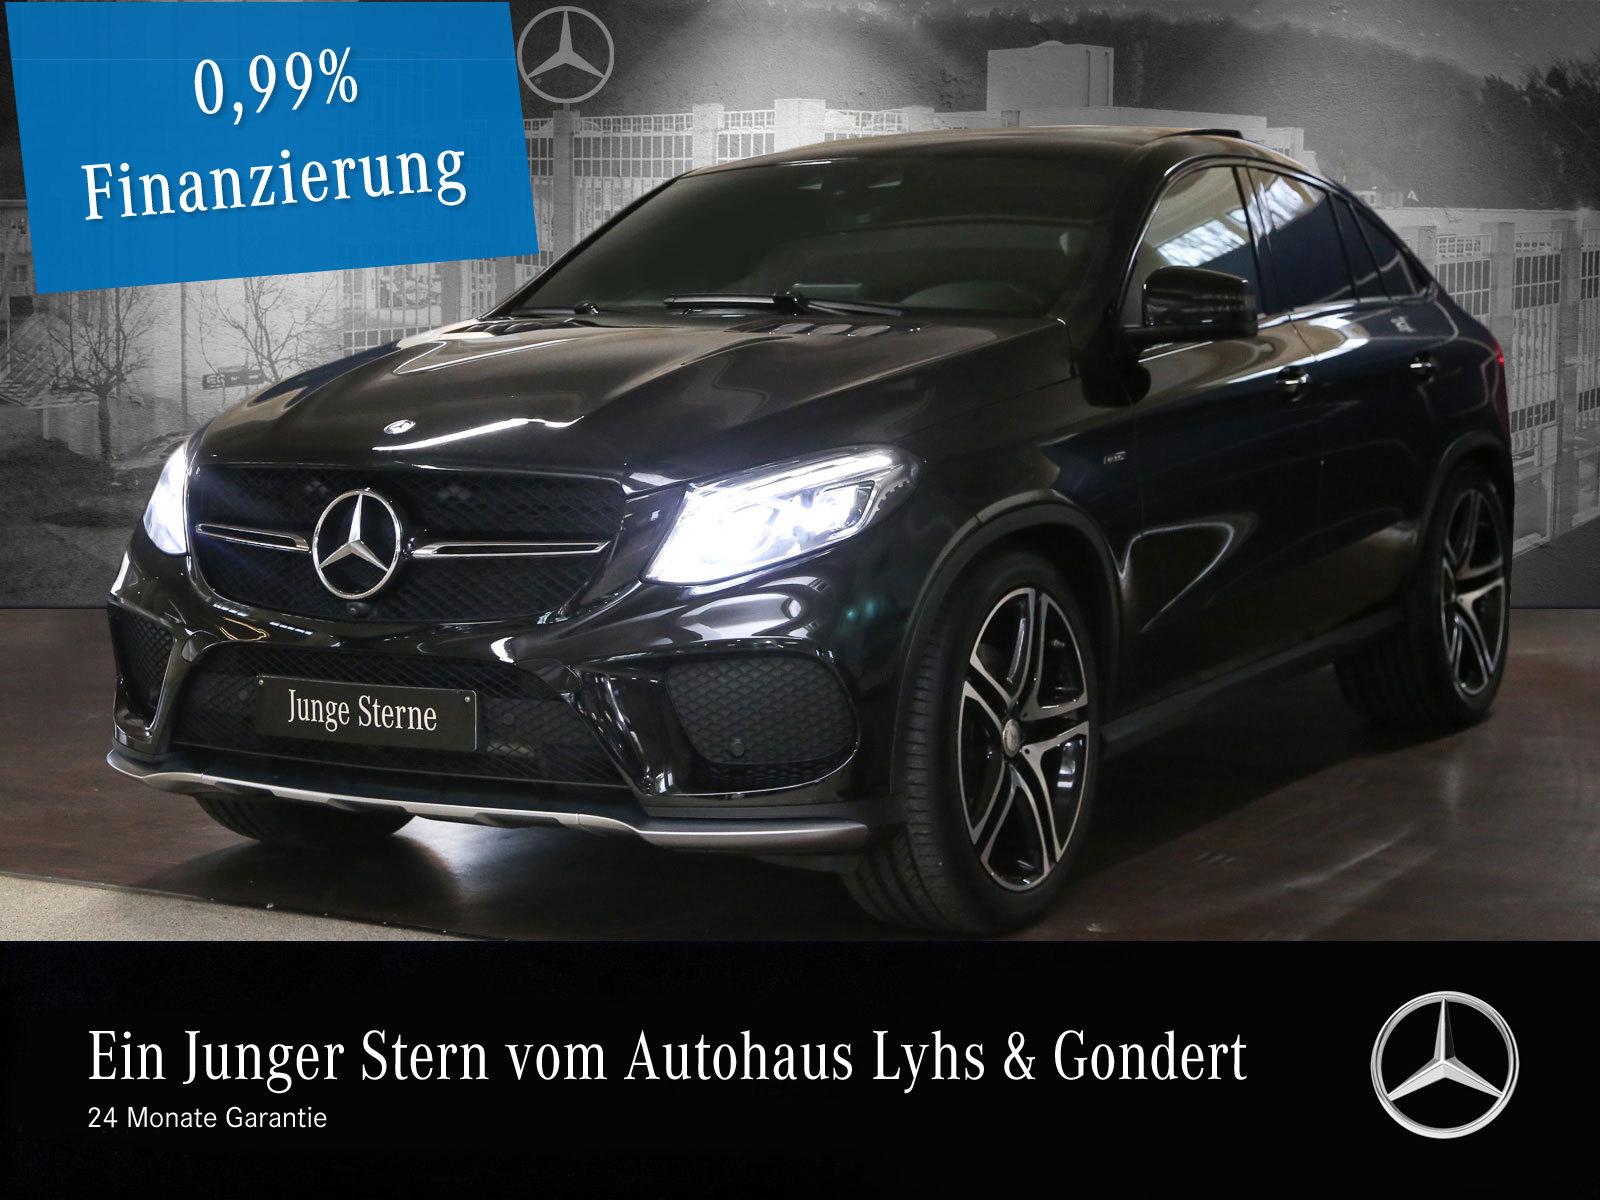 Mercedes-Benz GLE 450 AMG 4M Harman Fond-tv Comand Pano.-Dach, Jahr 2016, Benzin